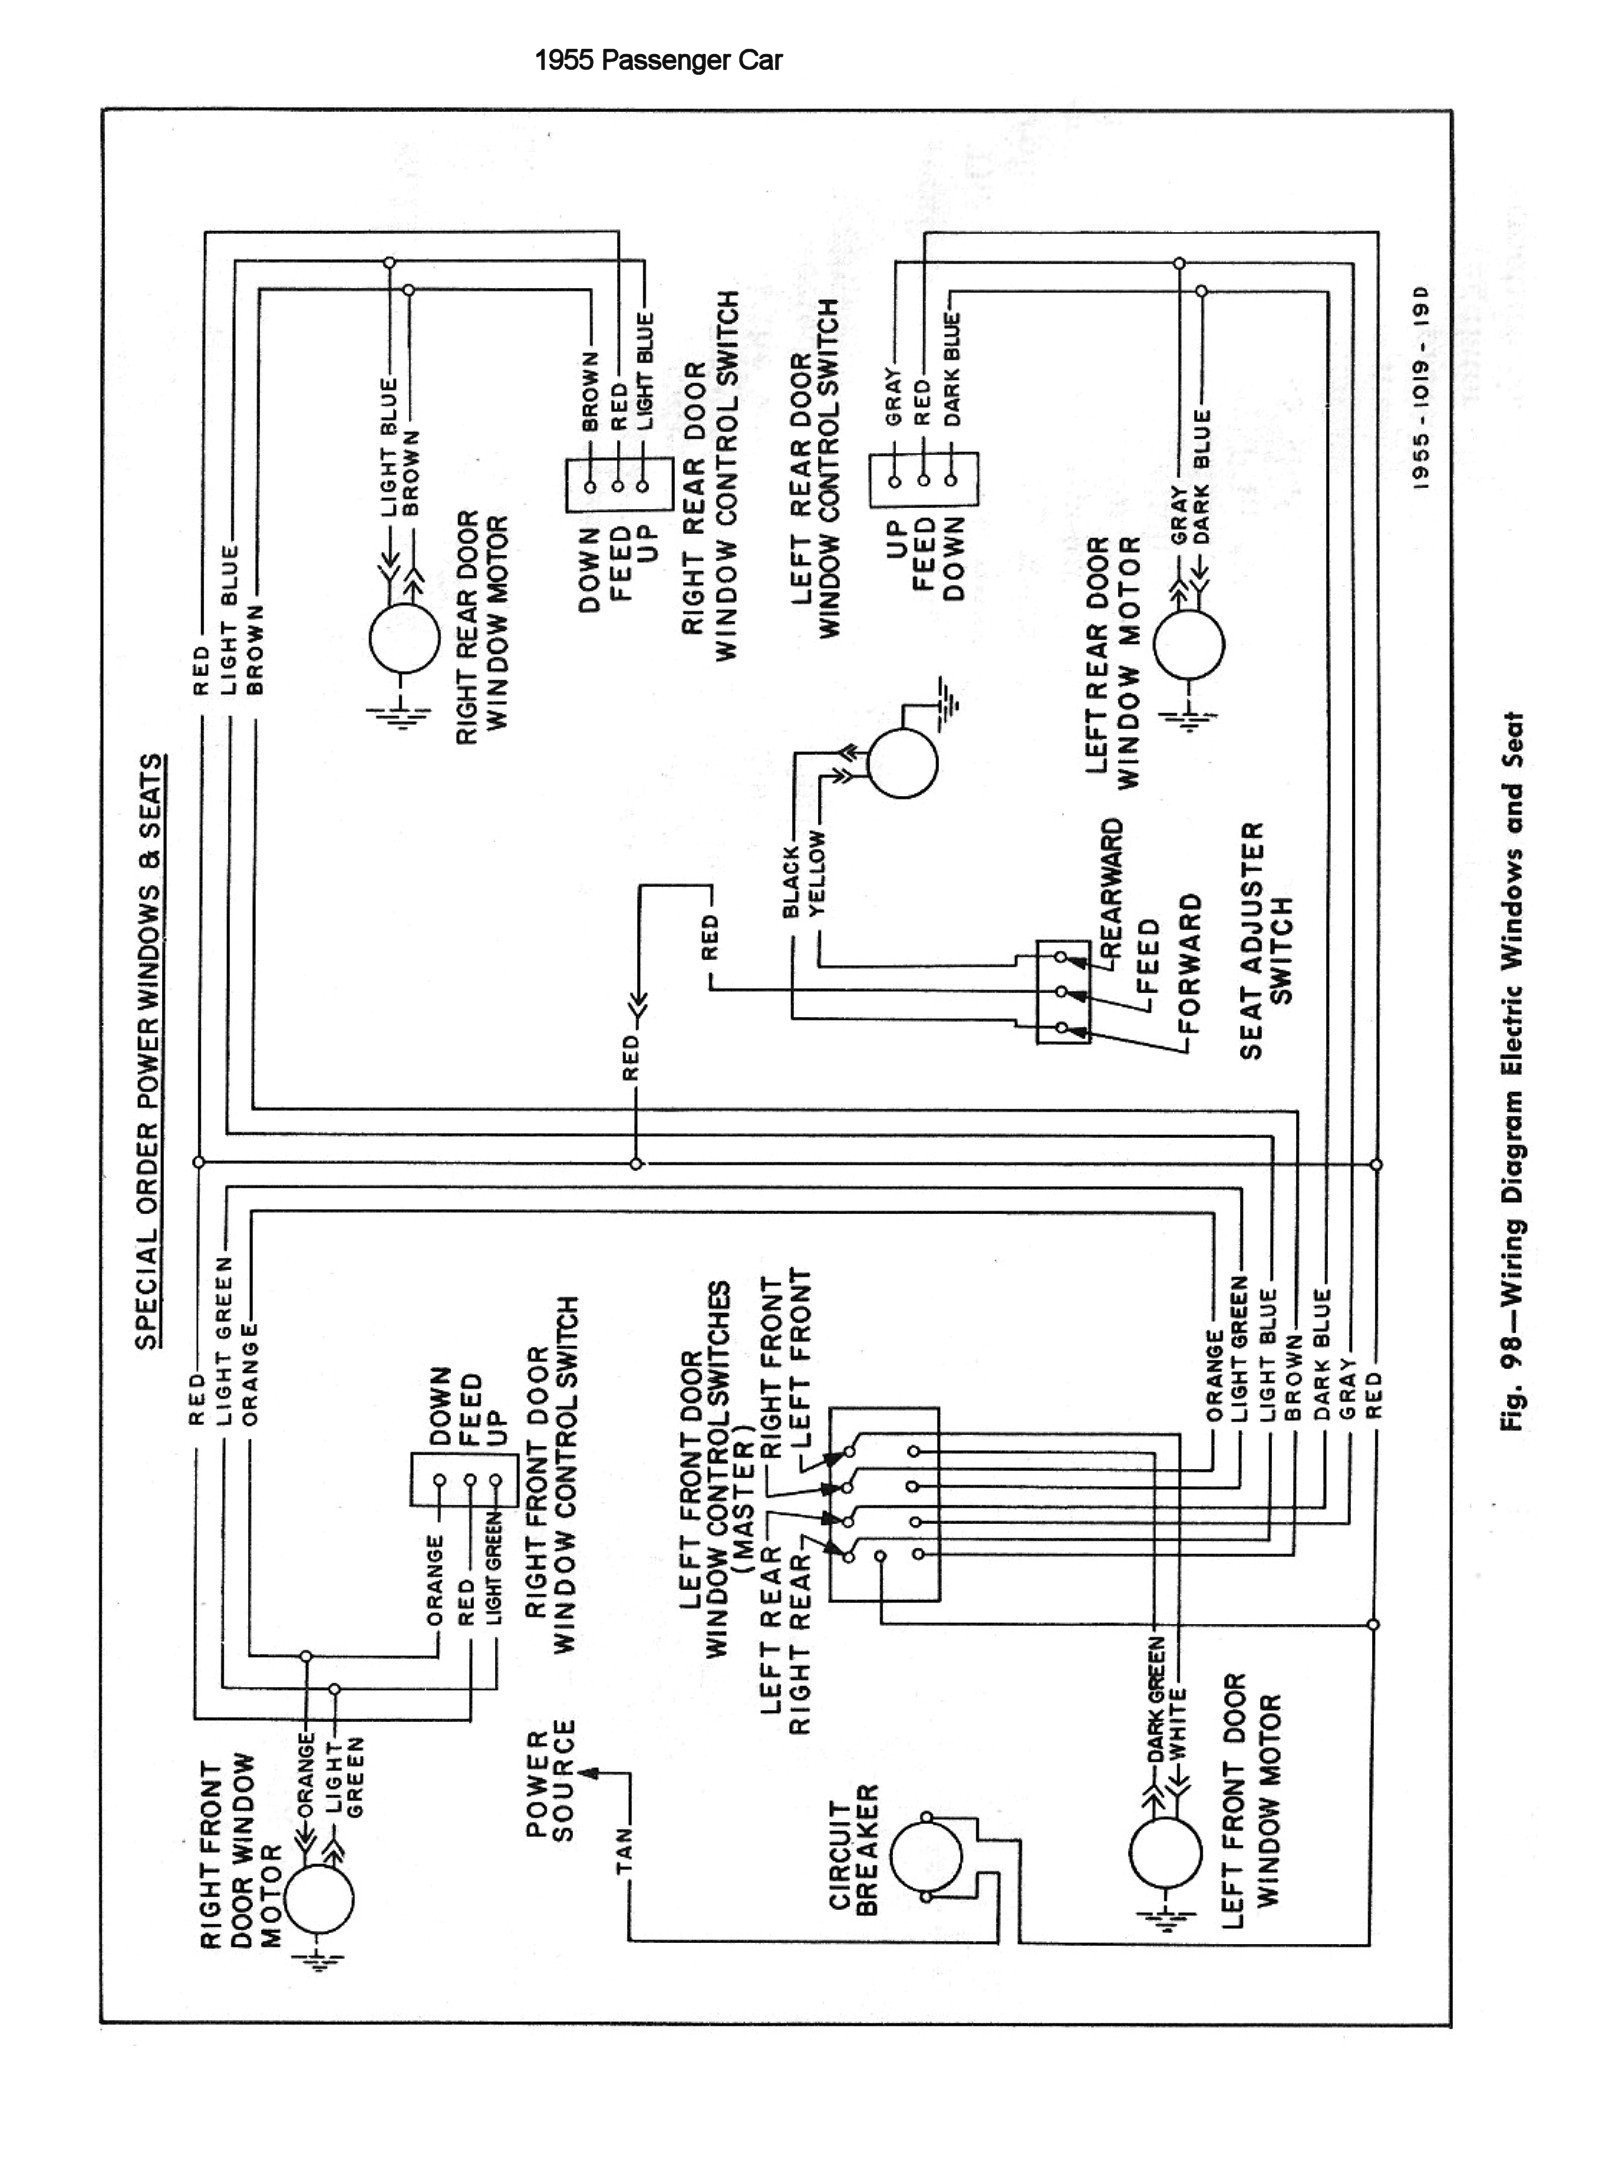 1956 Chevy Truck Wiring Diagram | Manual E-Books - 1994 Chevy Truck Wiring Diagram Free